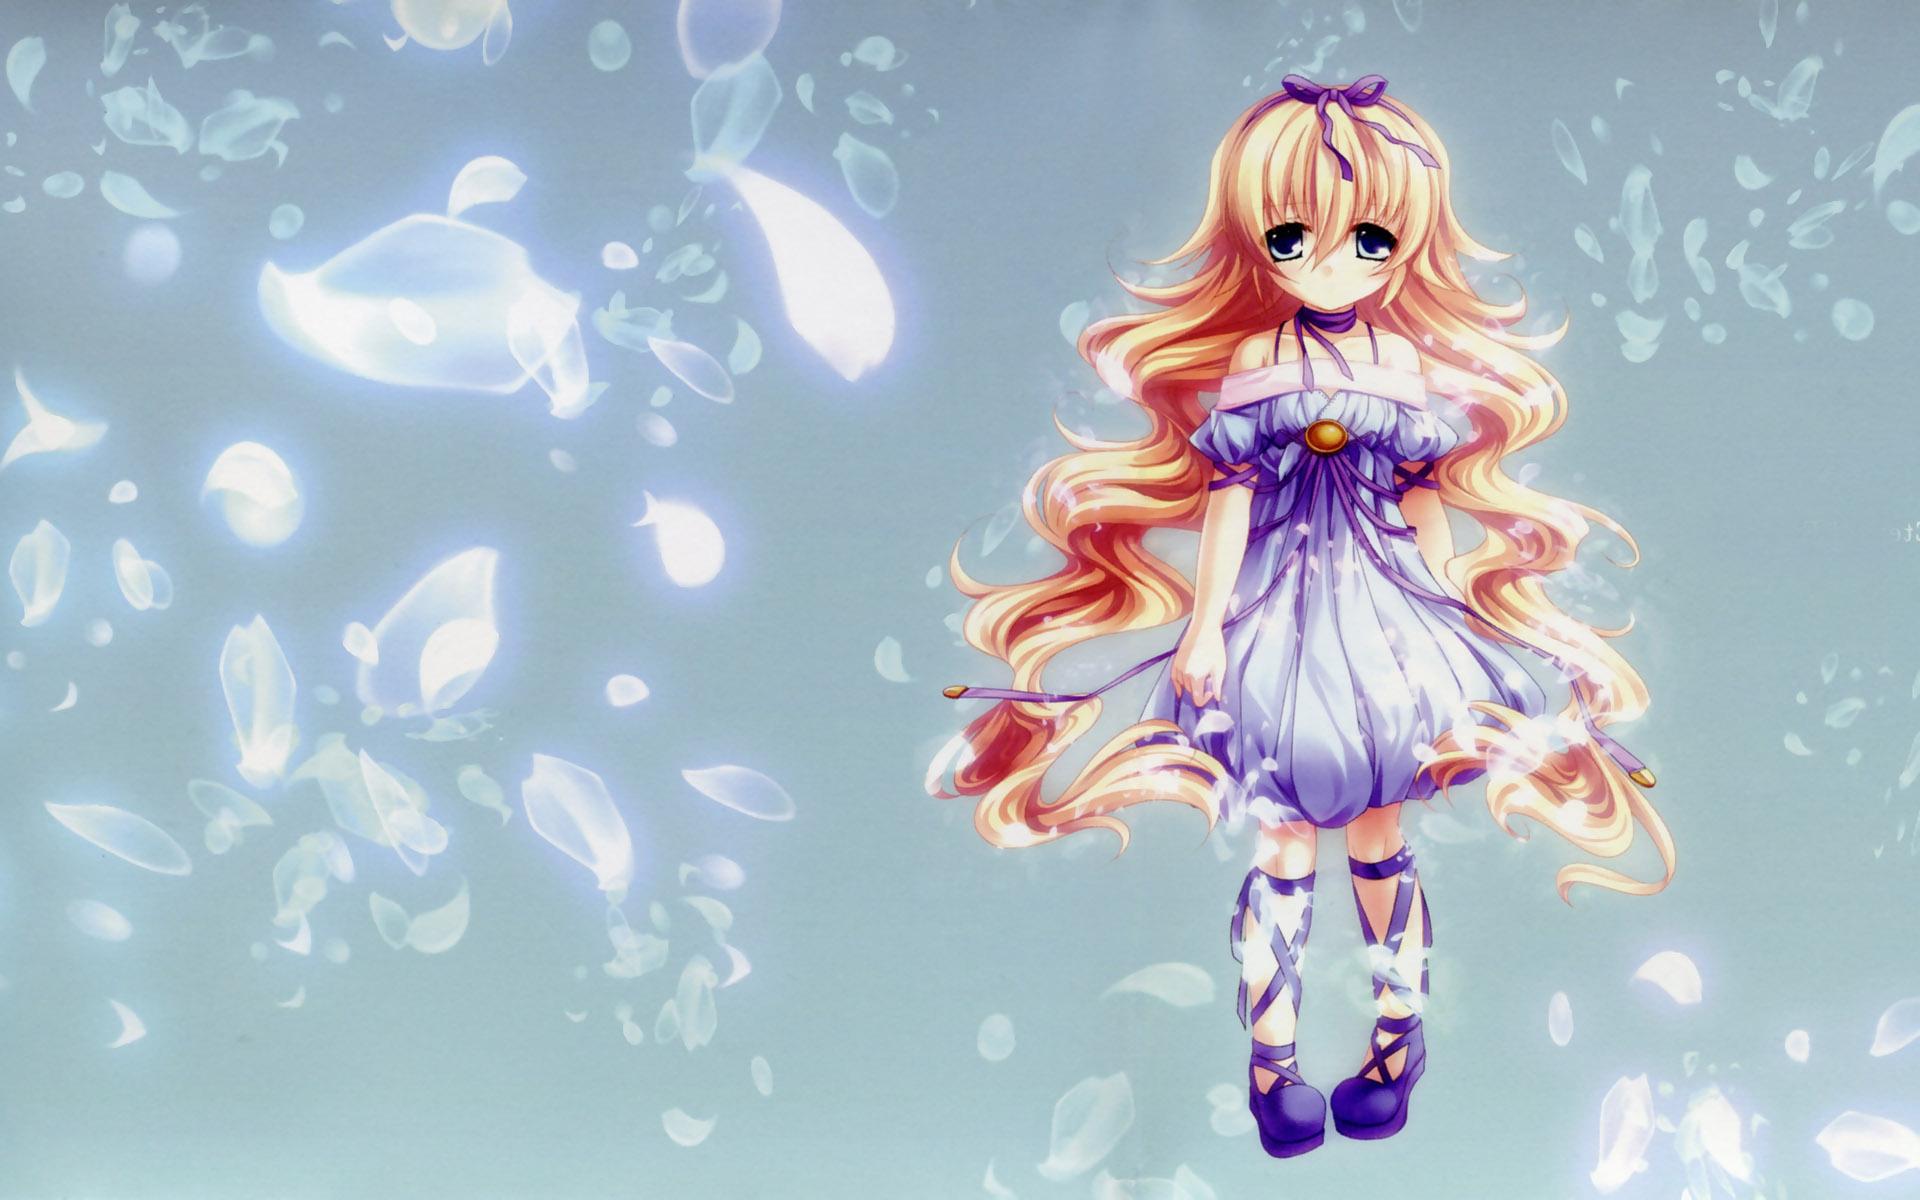 for desktop 24 wallpapers backgrounds cute anime girl for desktop 25 1920x1200